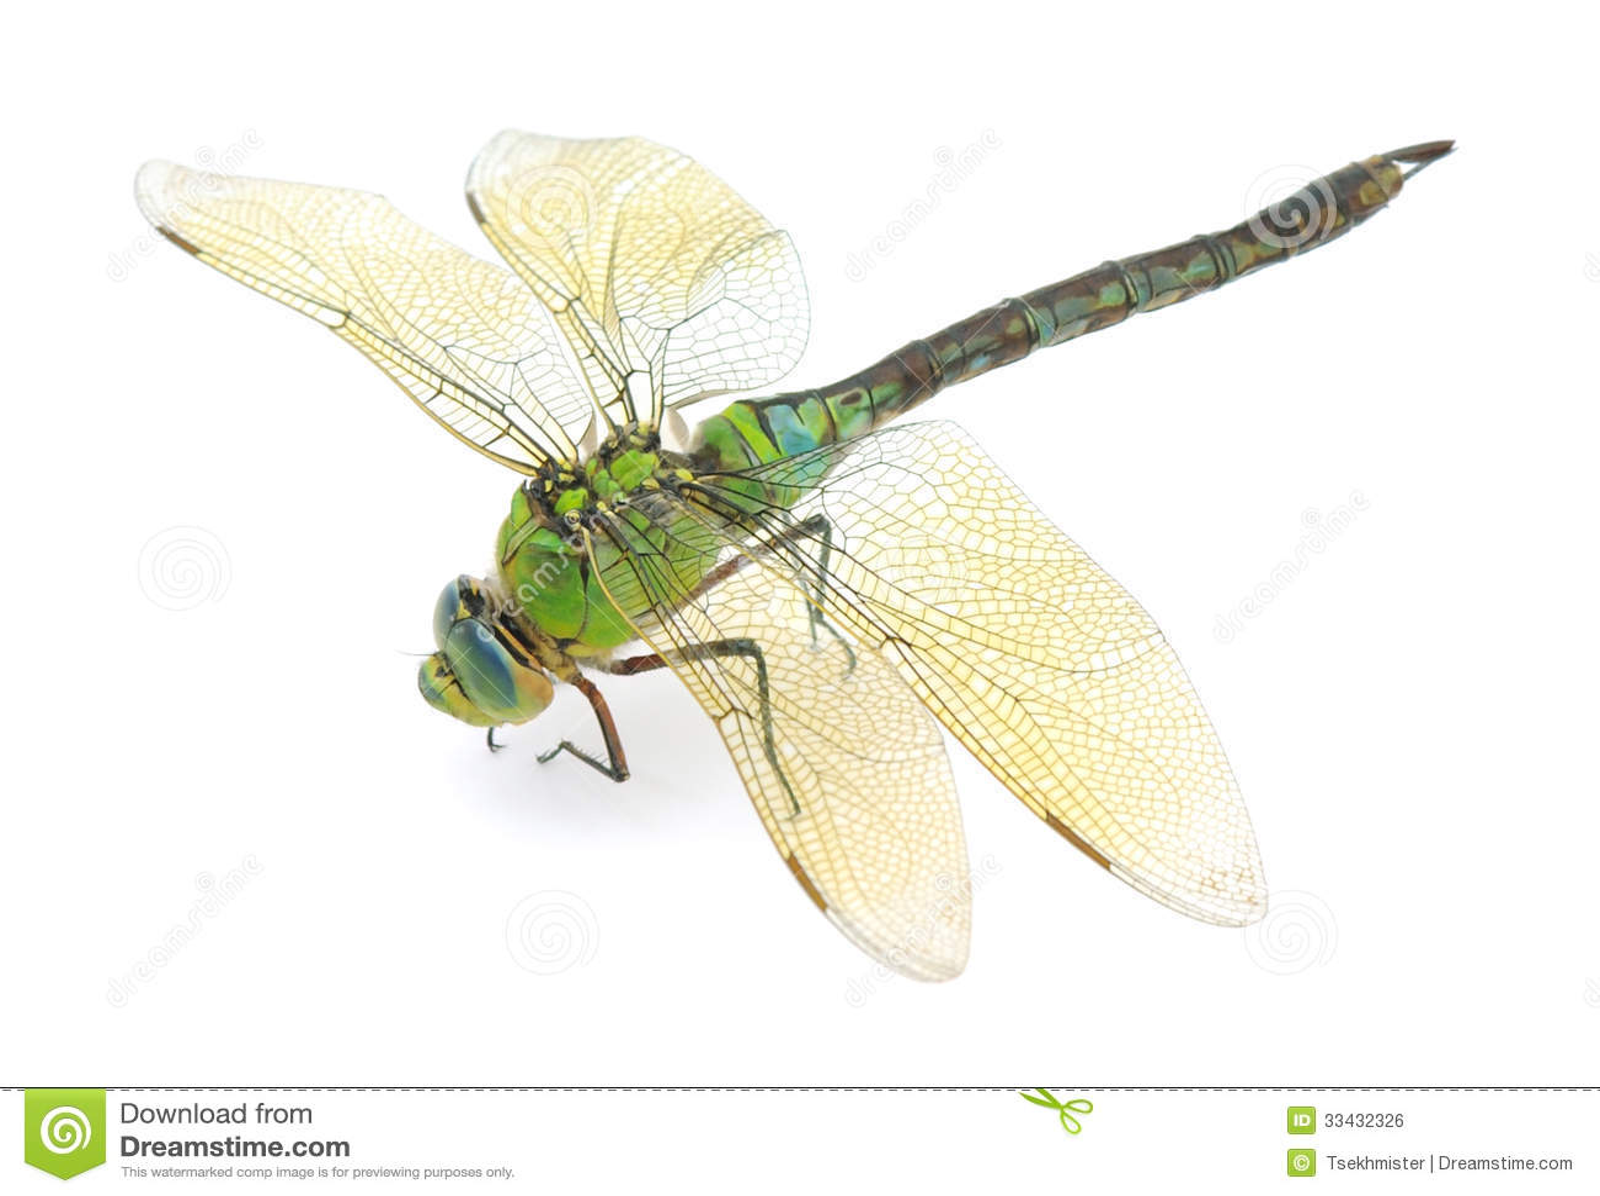 Dragonfly Royalty Free Stock Image - Image: 33432326